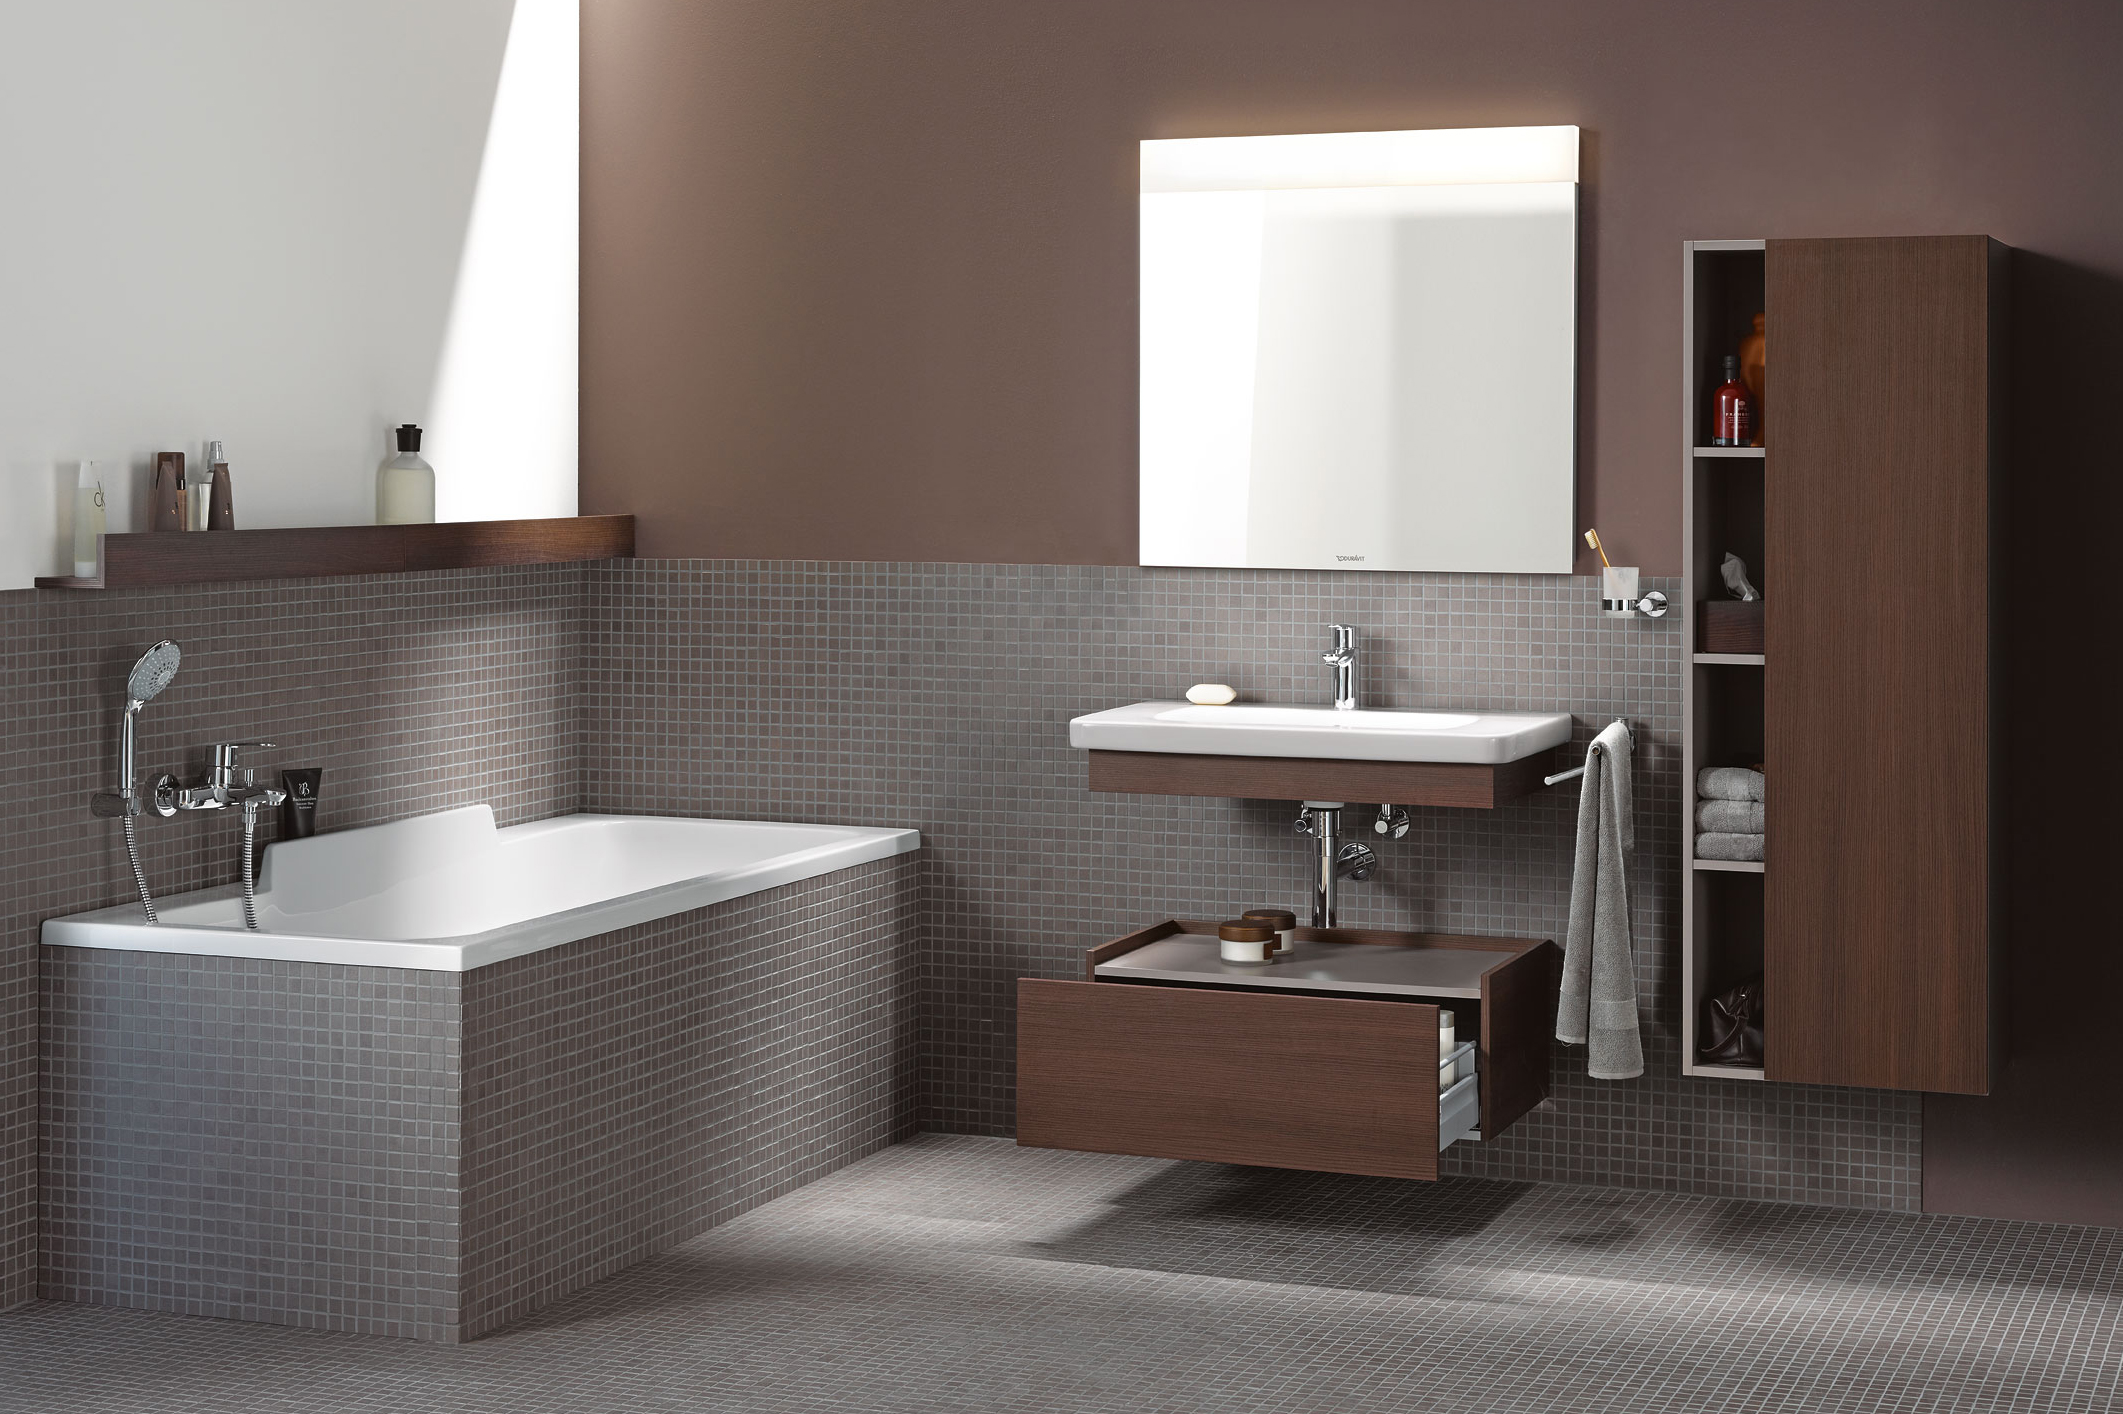 Hammam Badkamer Ideeen : Badkamer met inloopdouche best badkamer ideeen inloopdouche